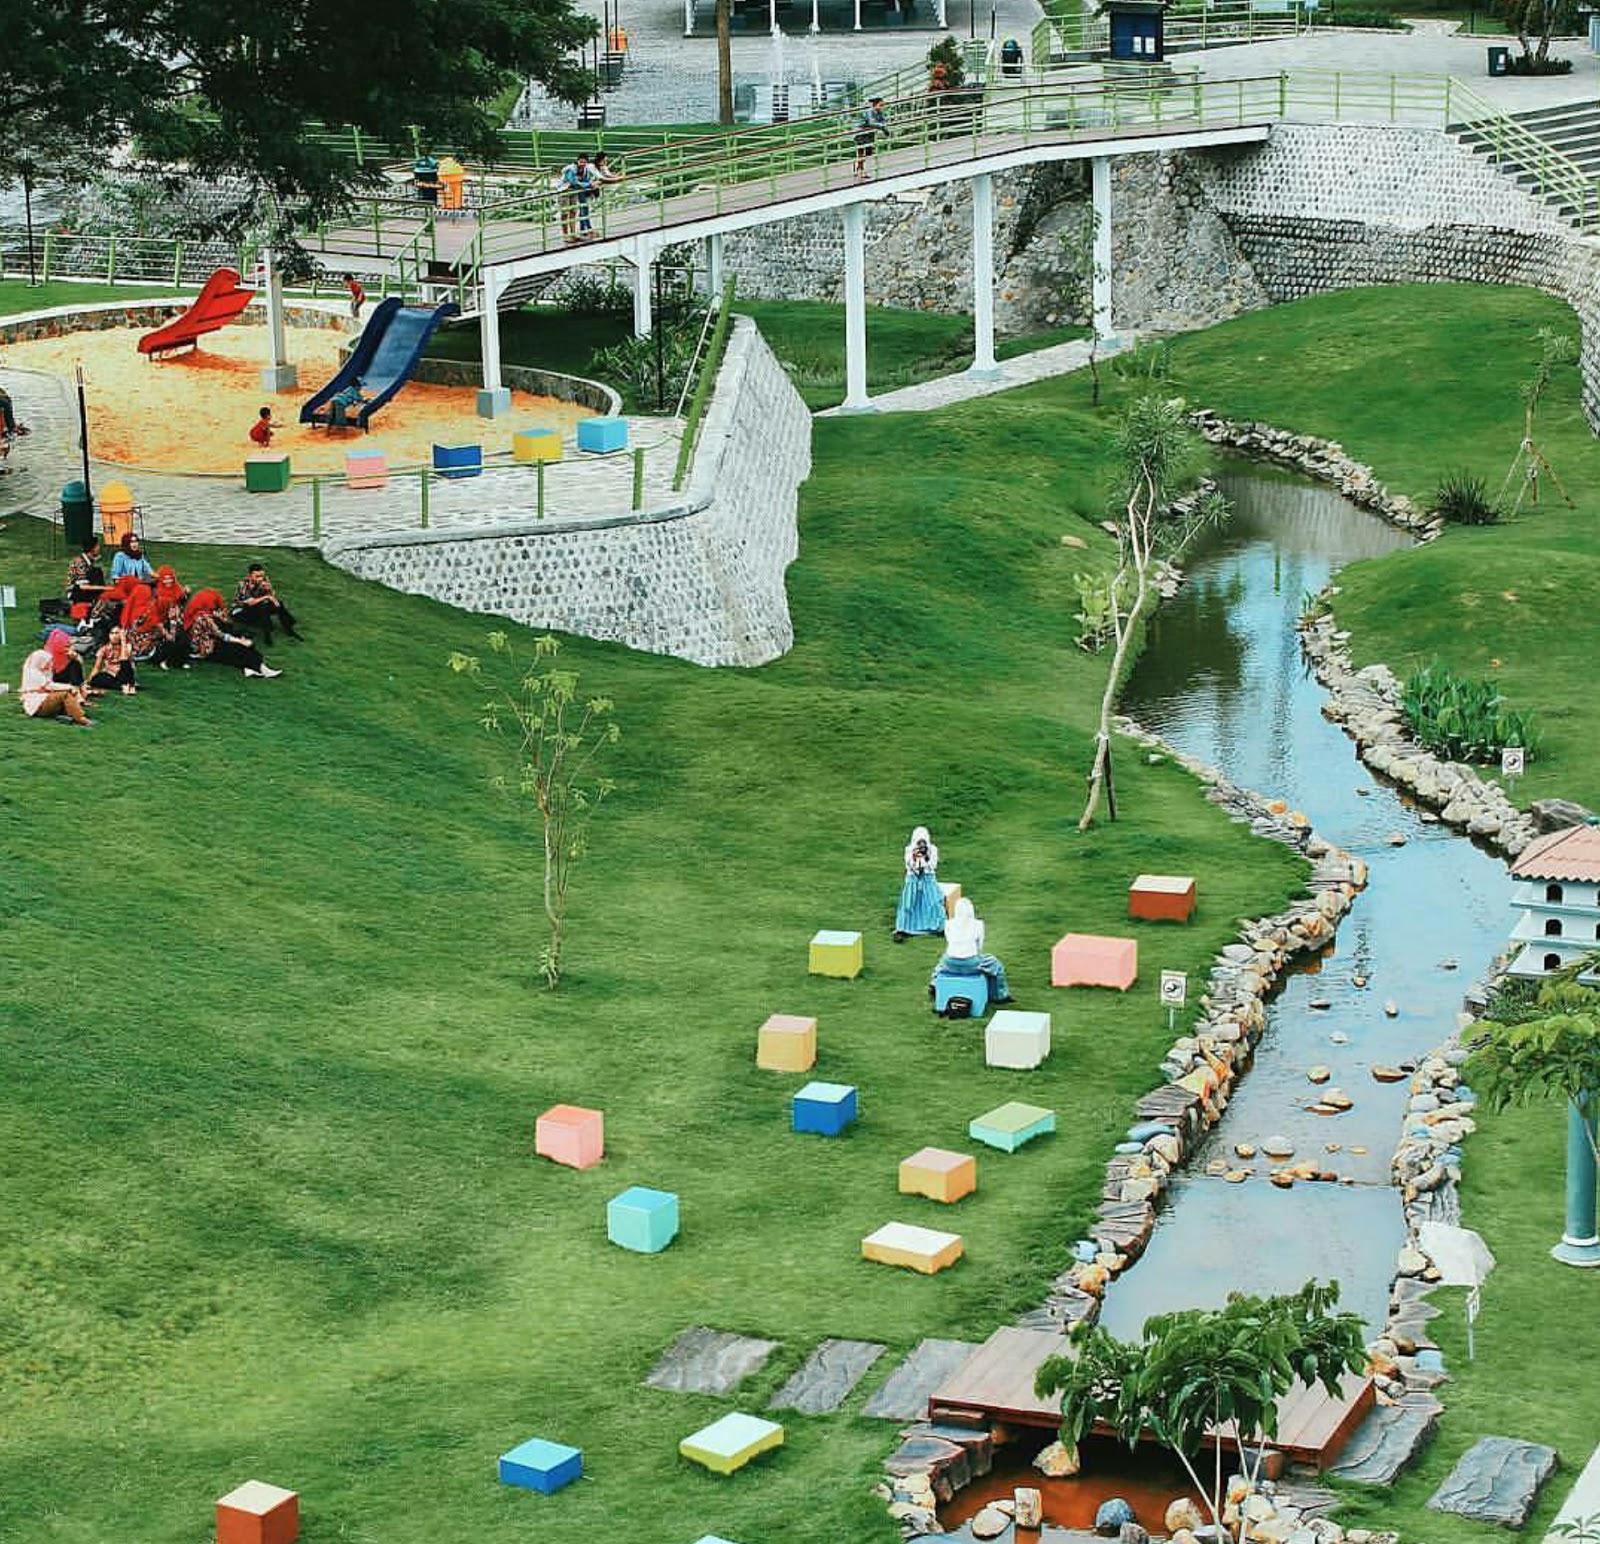 Taman Hijau Slg Wisata Kediri Air Mancur Rest Area Gardu